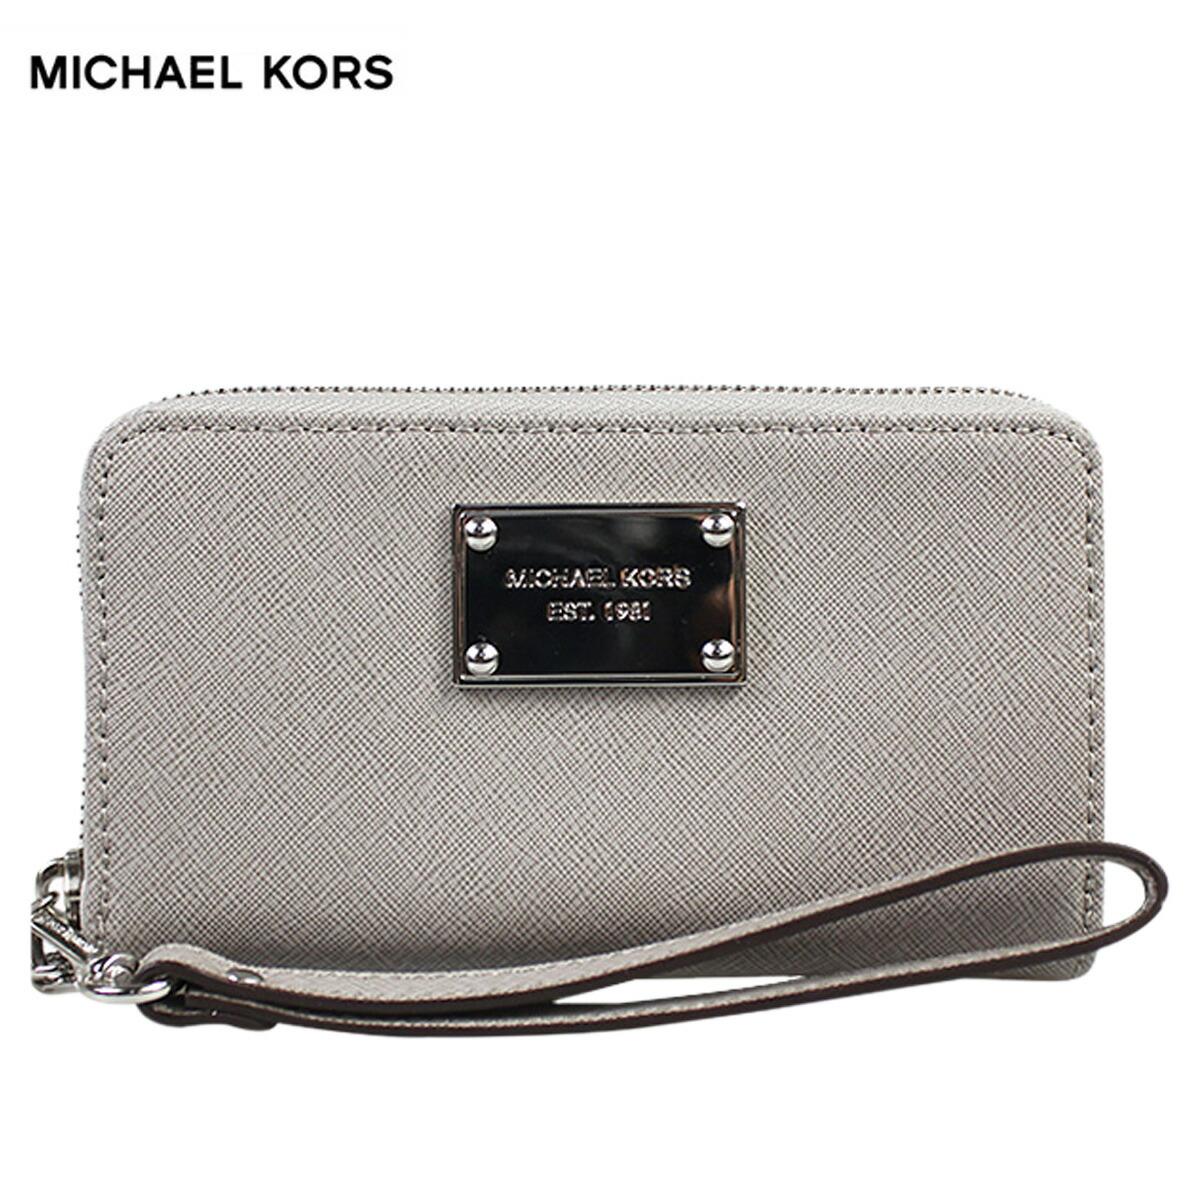 68481334ce9e MICHAEL KORS   ☆ wallet ☆ LARGE MULTIFUNCTION PHONE CASE STYLE  32F3SELZ7L